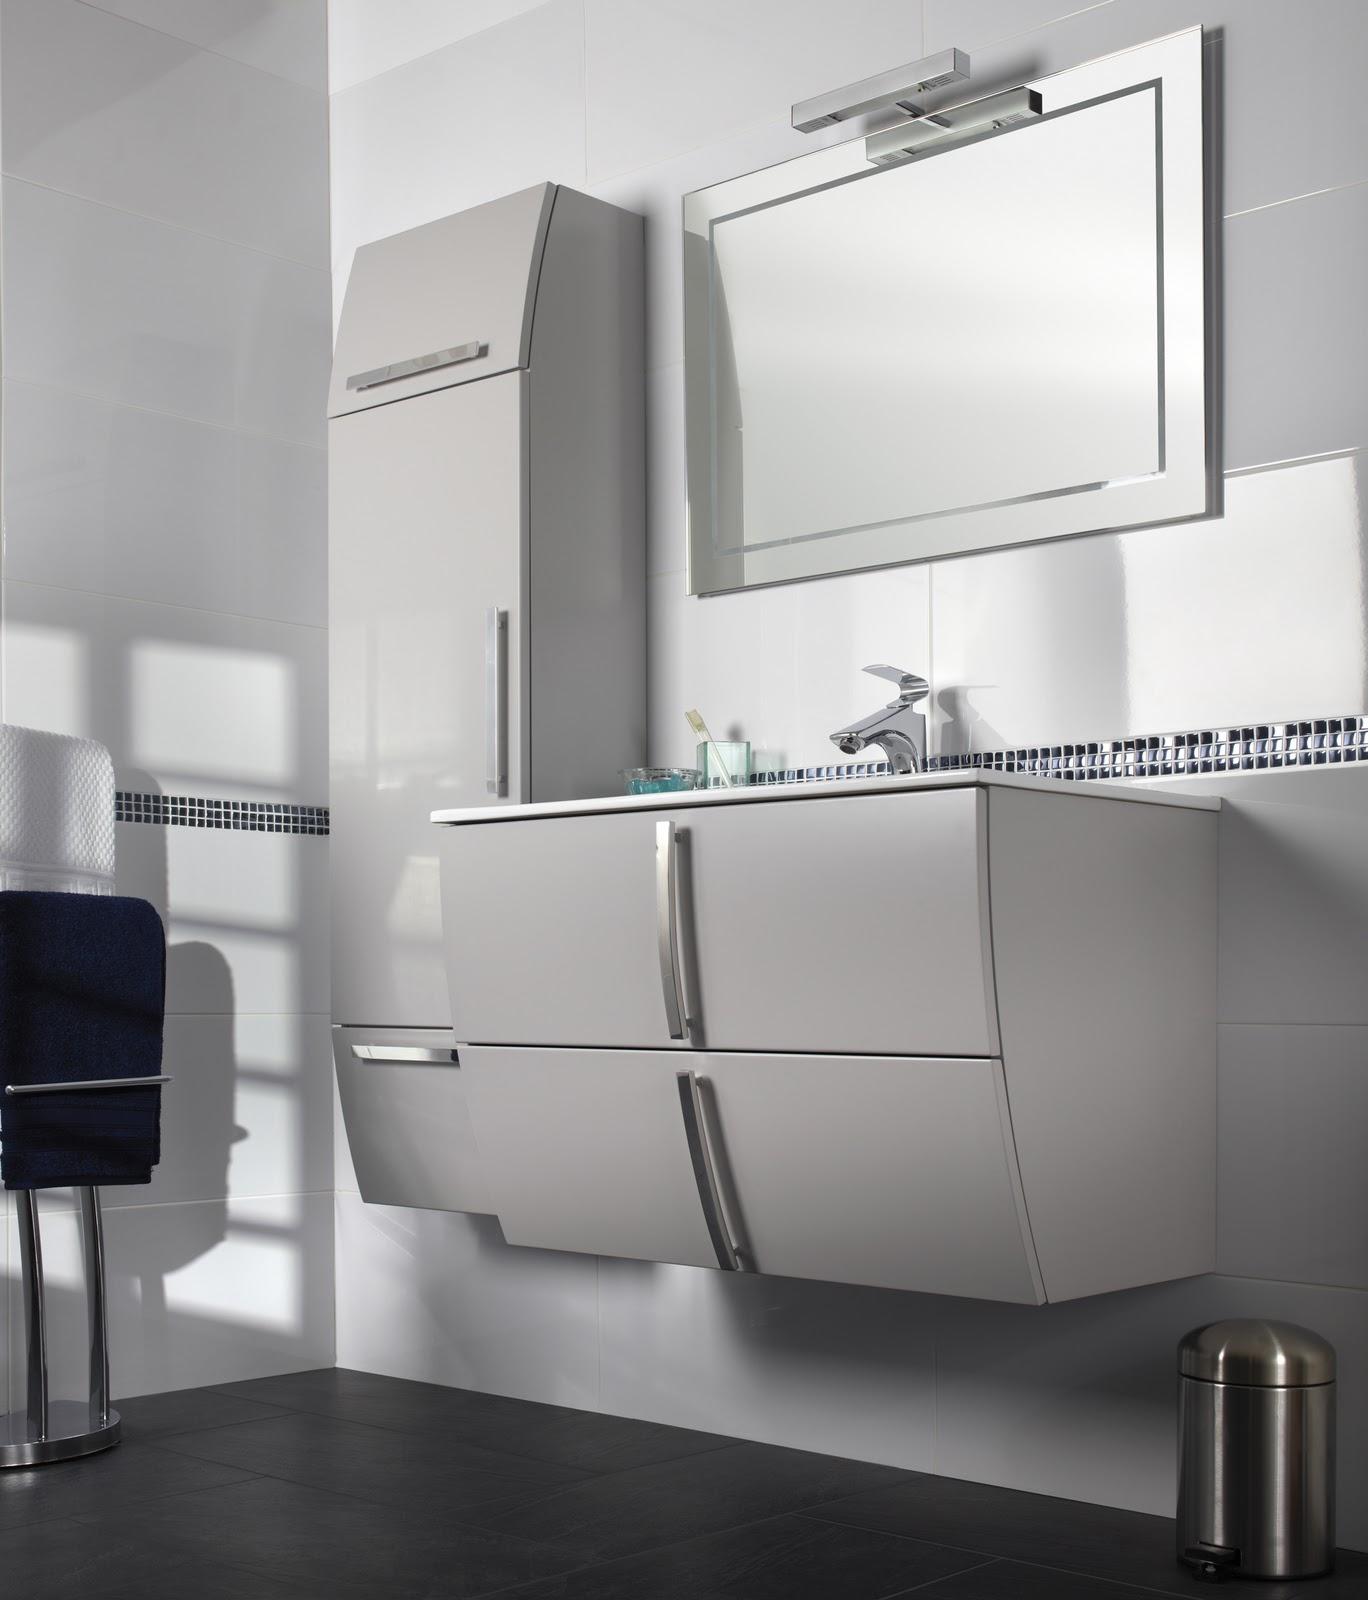 Meubles salle de bain rangement salle de bain achat - Achat meuble salle de bain ...